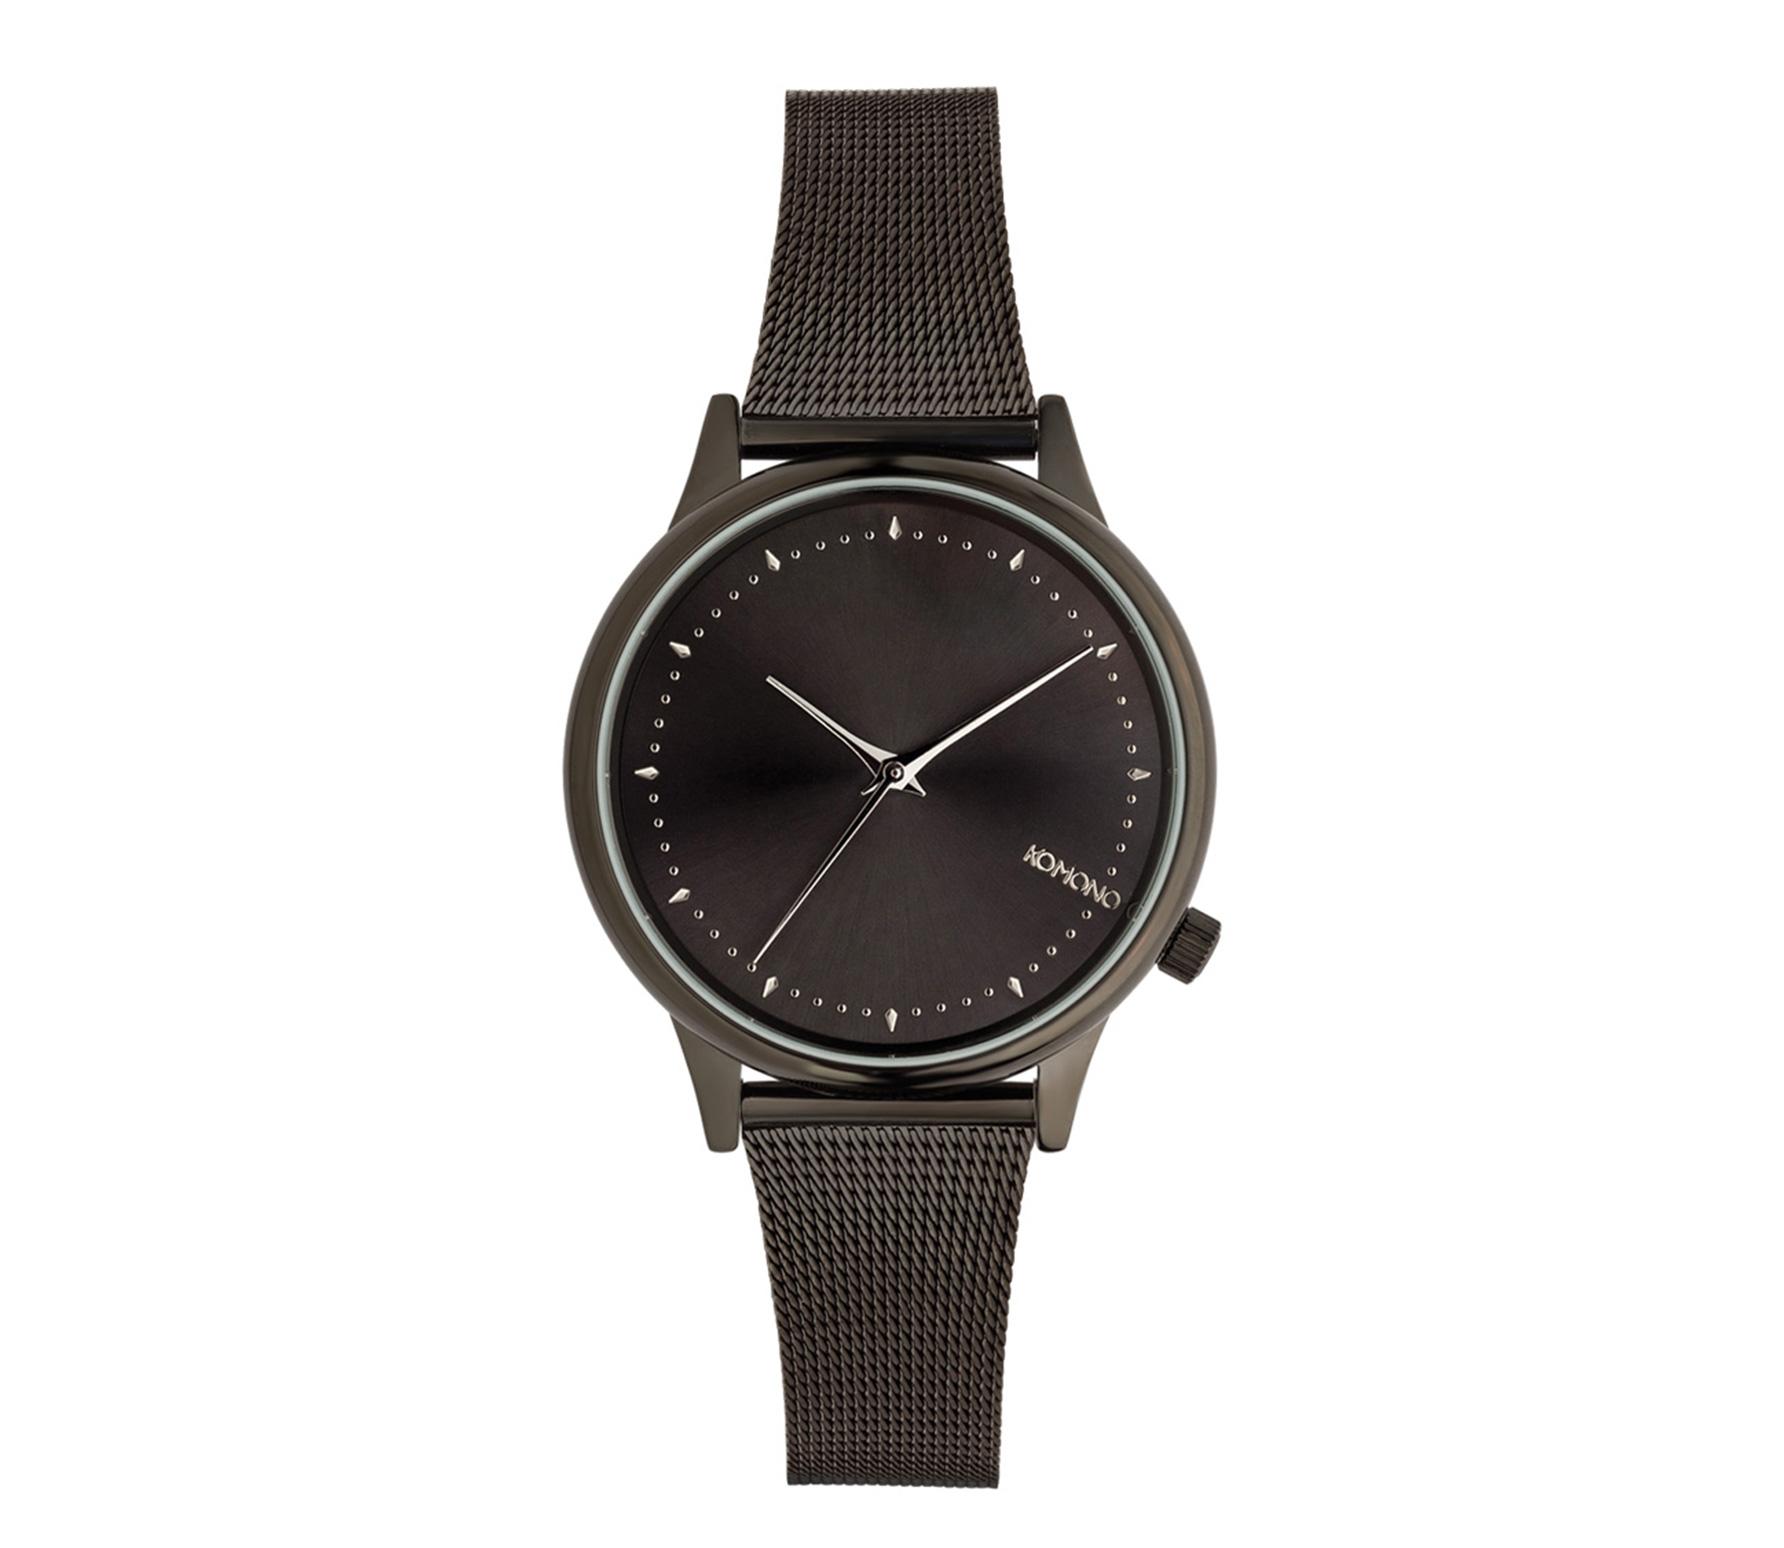 Komono horloge Estelle Royale zwart/zilver stainless steel